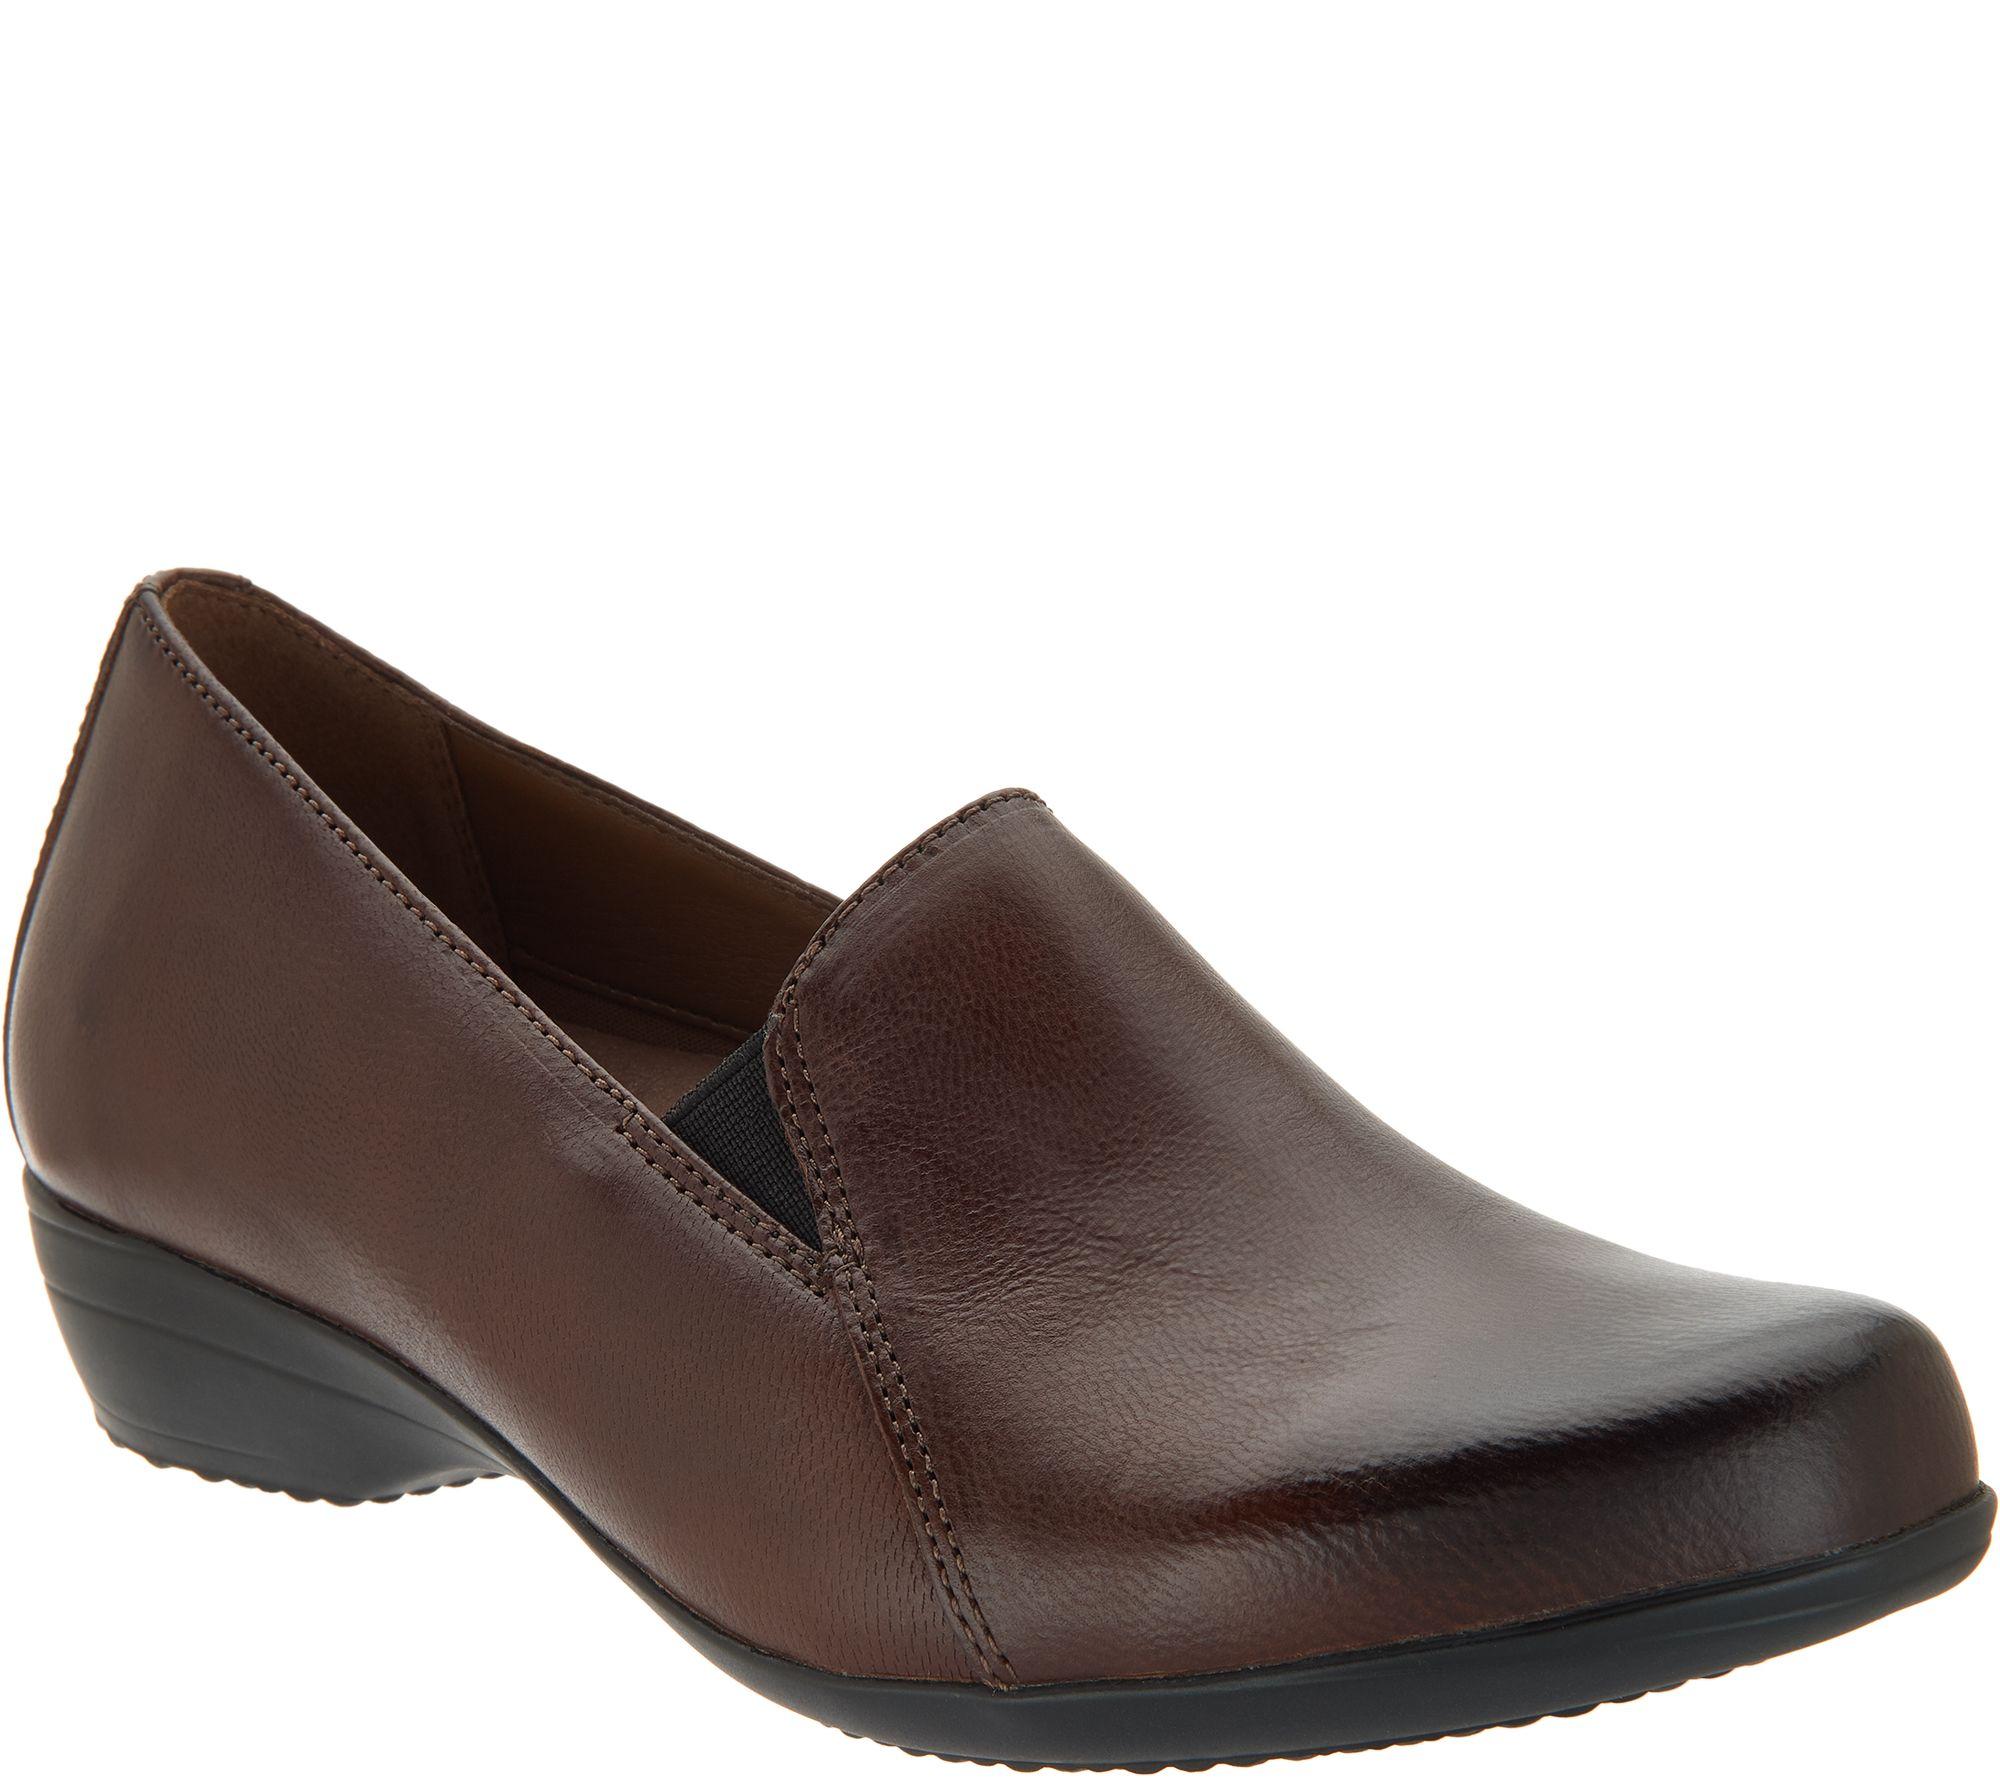 1737fffd503 Dansko Leather Slip-On Loafers - Farah - Page 1 — QVC.com